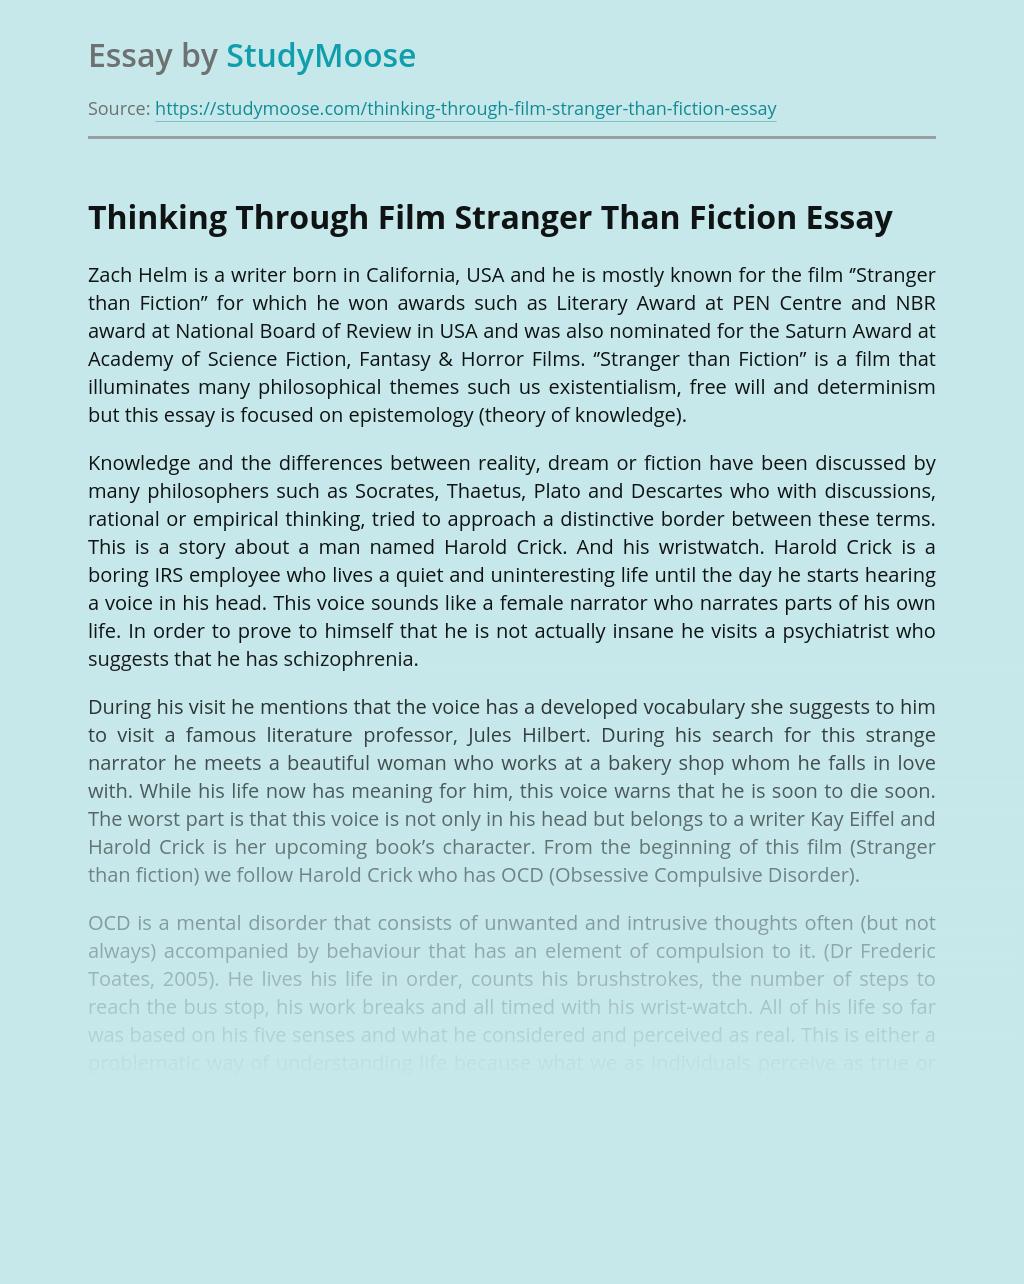 Thinking Through Film Stranger Than Fiction